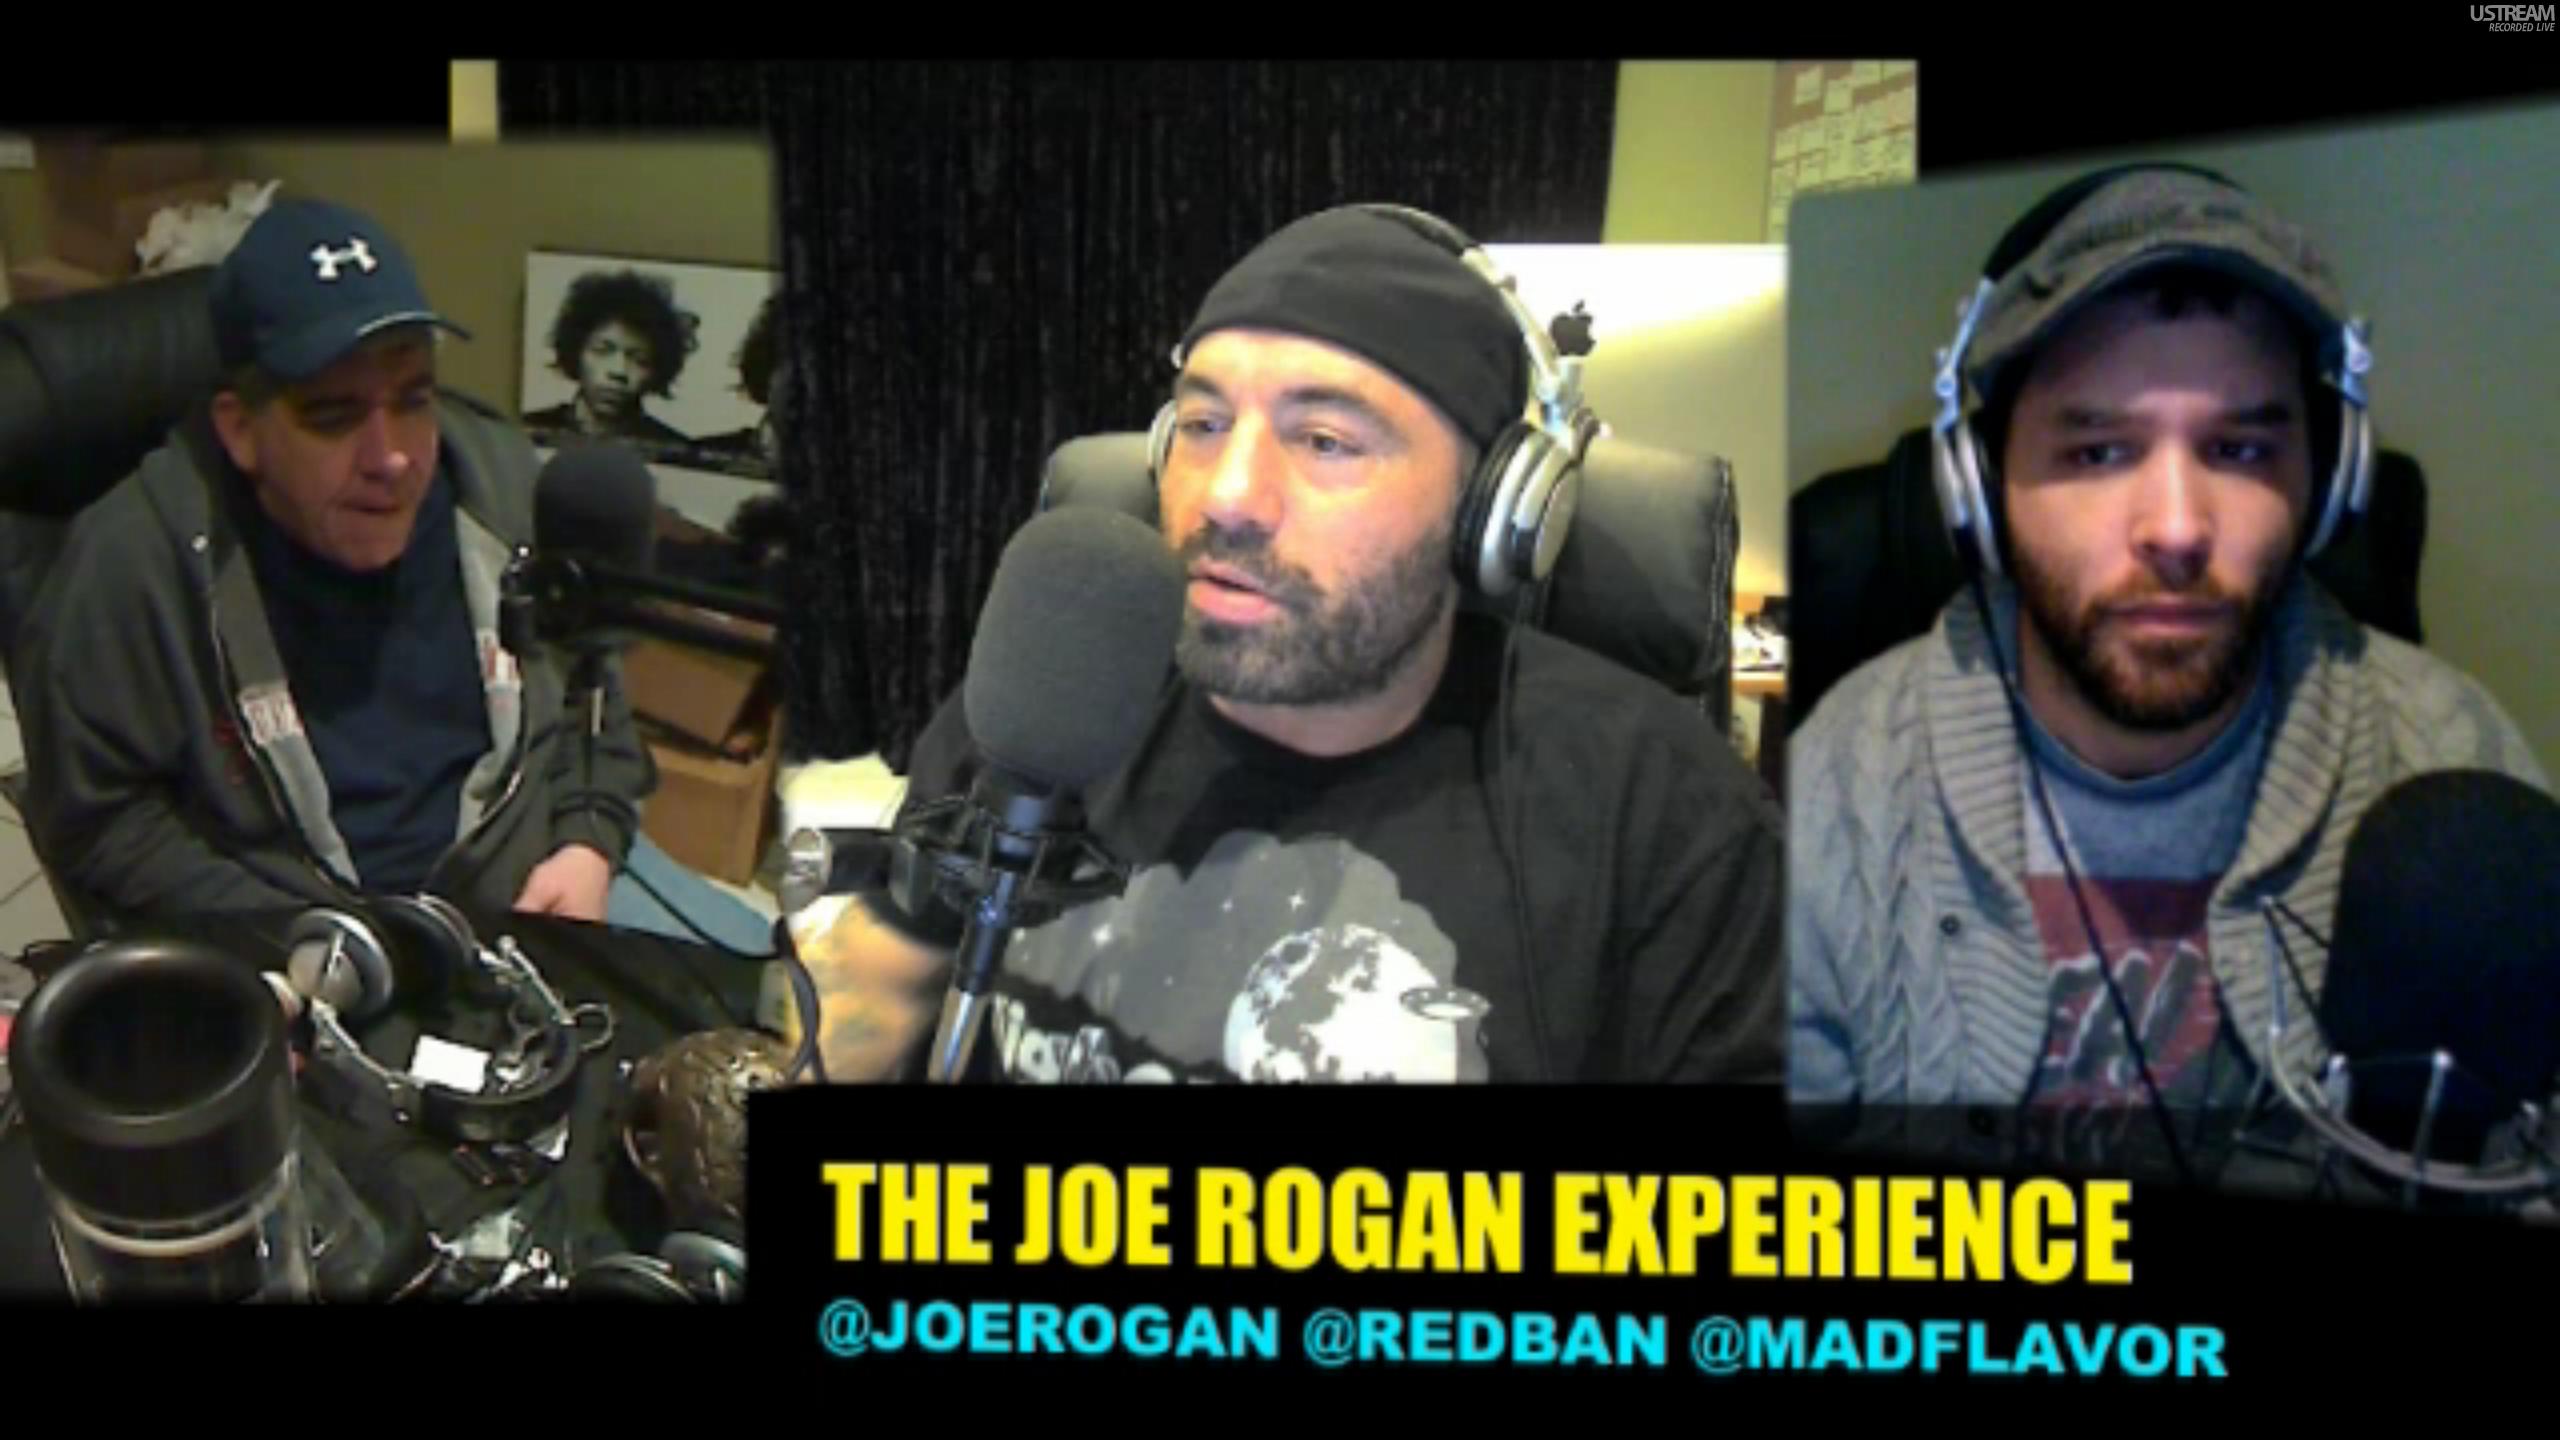 The Joe Rogan Experience PODCAST #178 - Joey Diaz, Brian Redban